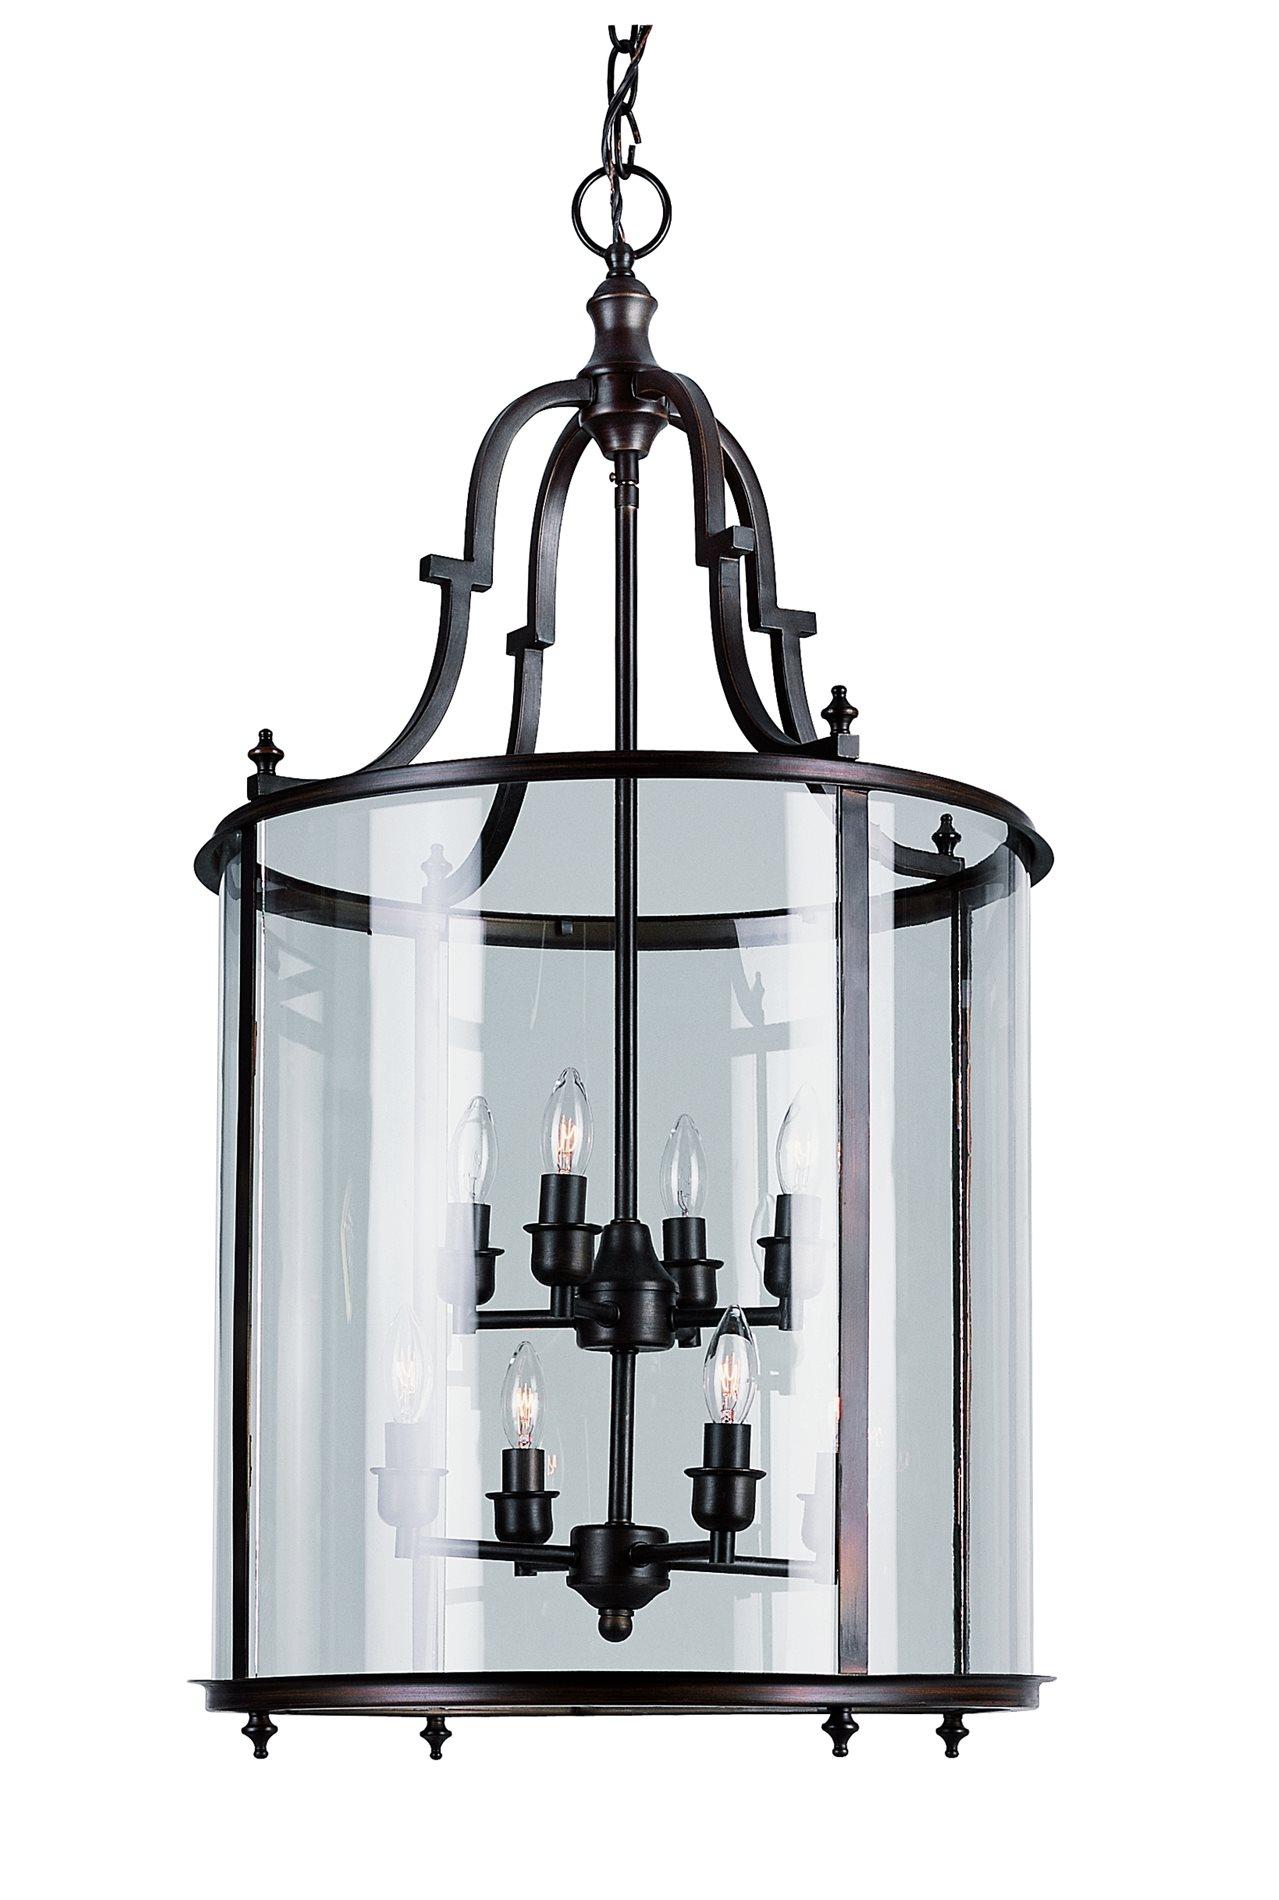 Foyer Lighting Replacement Glass : Trans globe lighting transitional foyer light tg